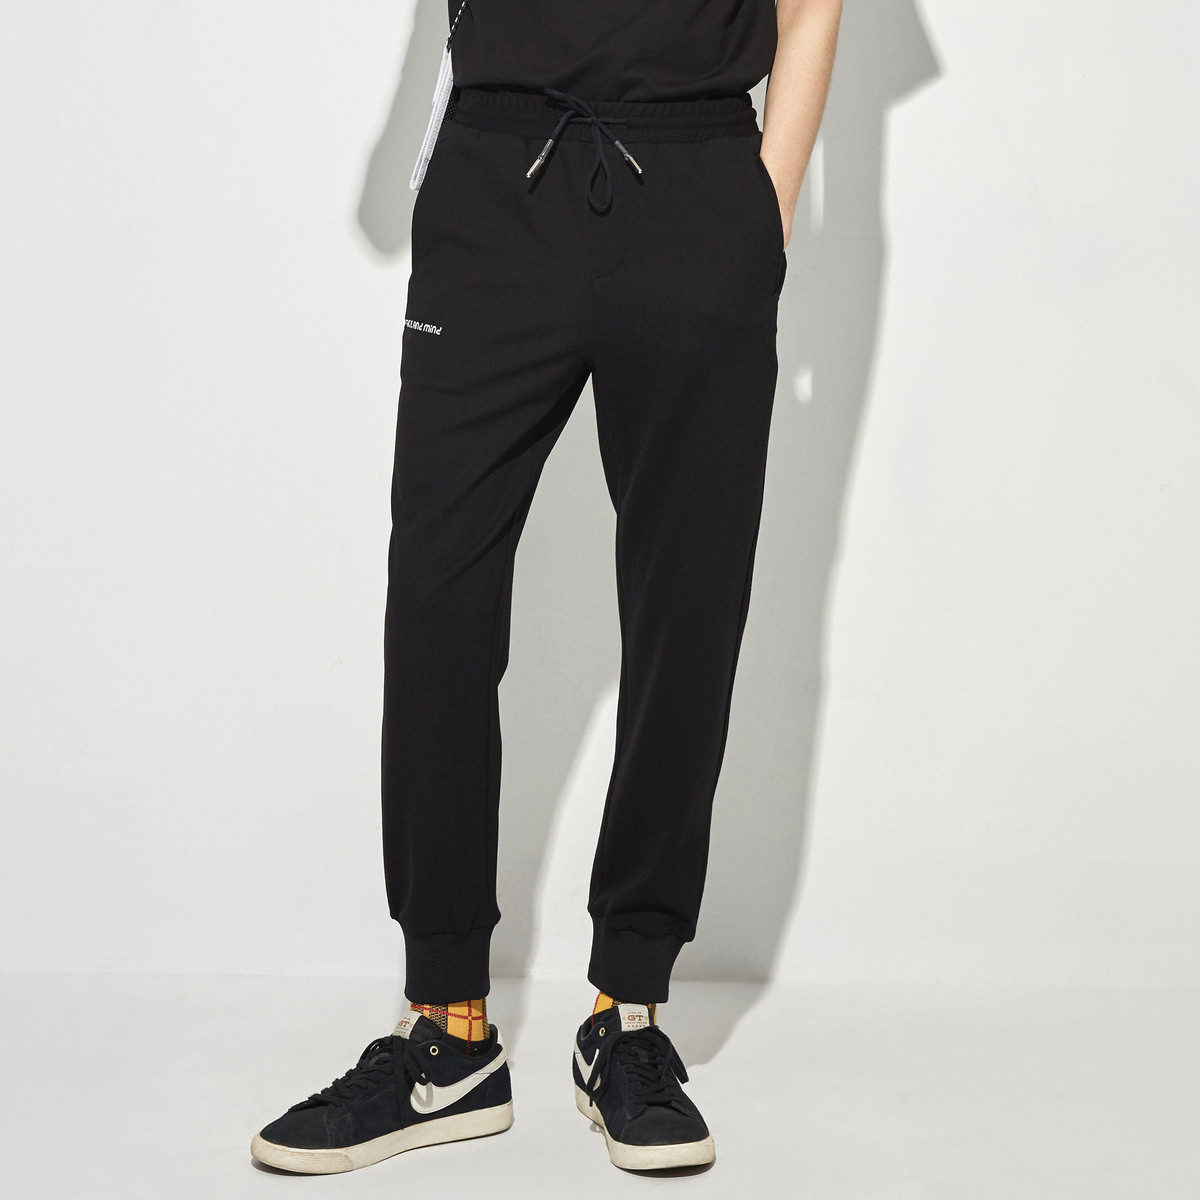 gxg.jeansgxg jeans男装2018夏新款男士休闲裤182602261000